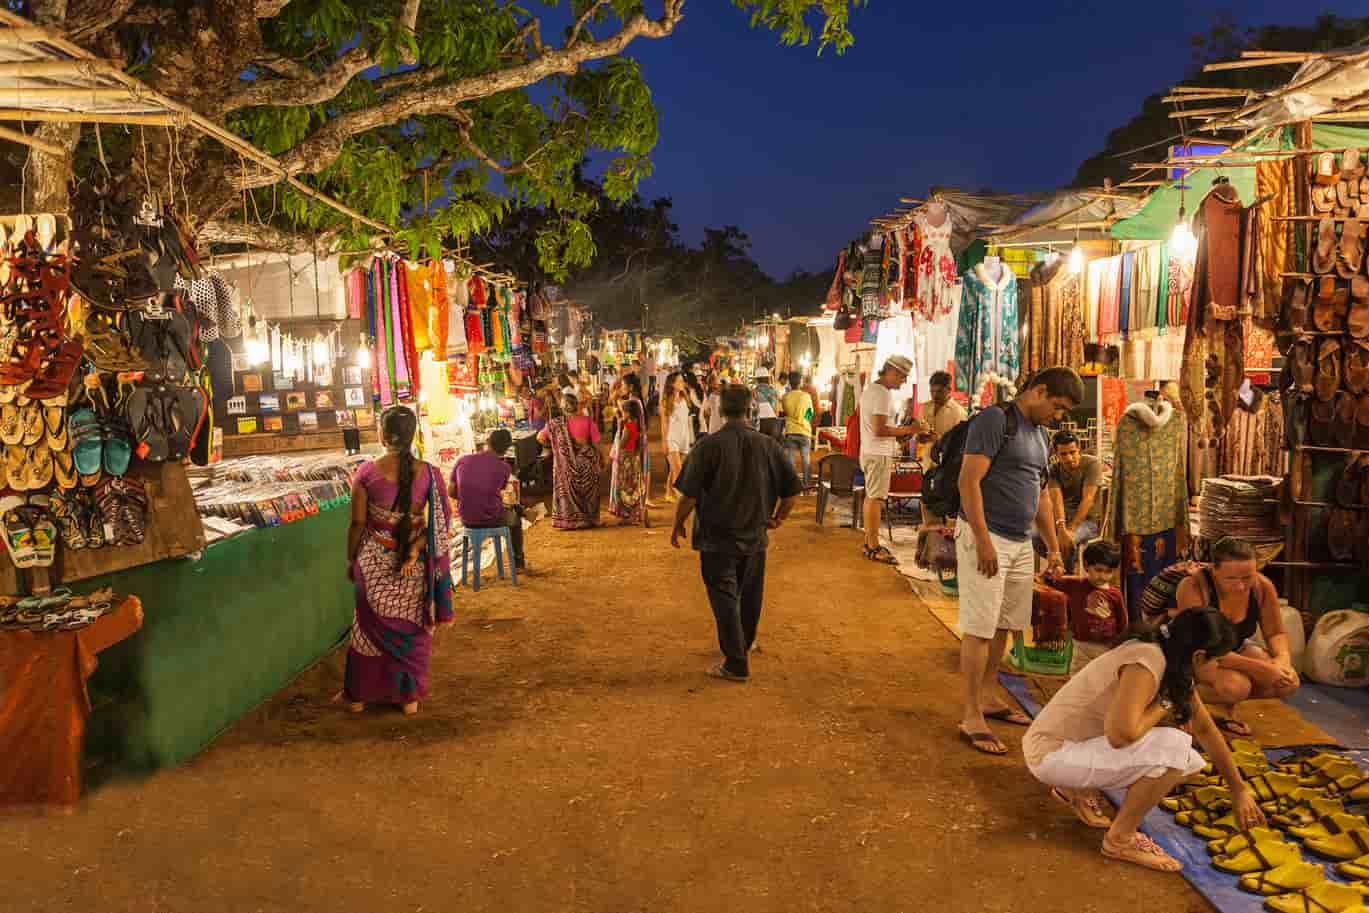 Best Shopping 12 Goa Treebo Markets Street Places In Goa wwq1IC